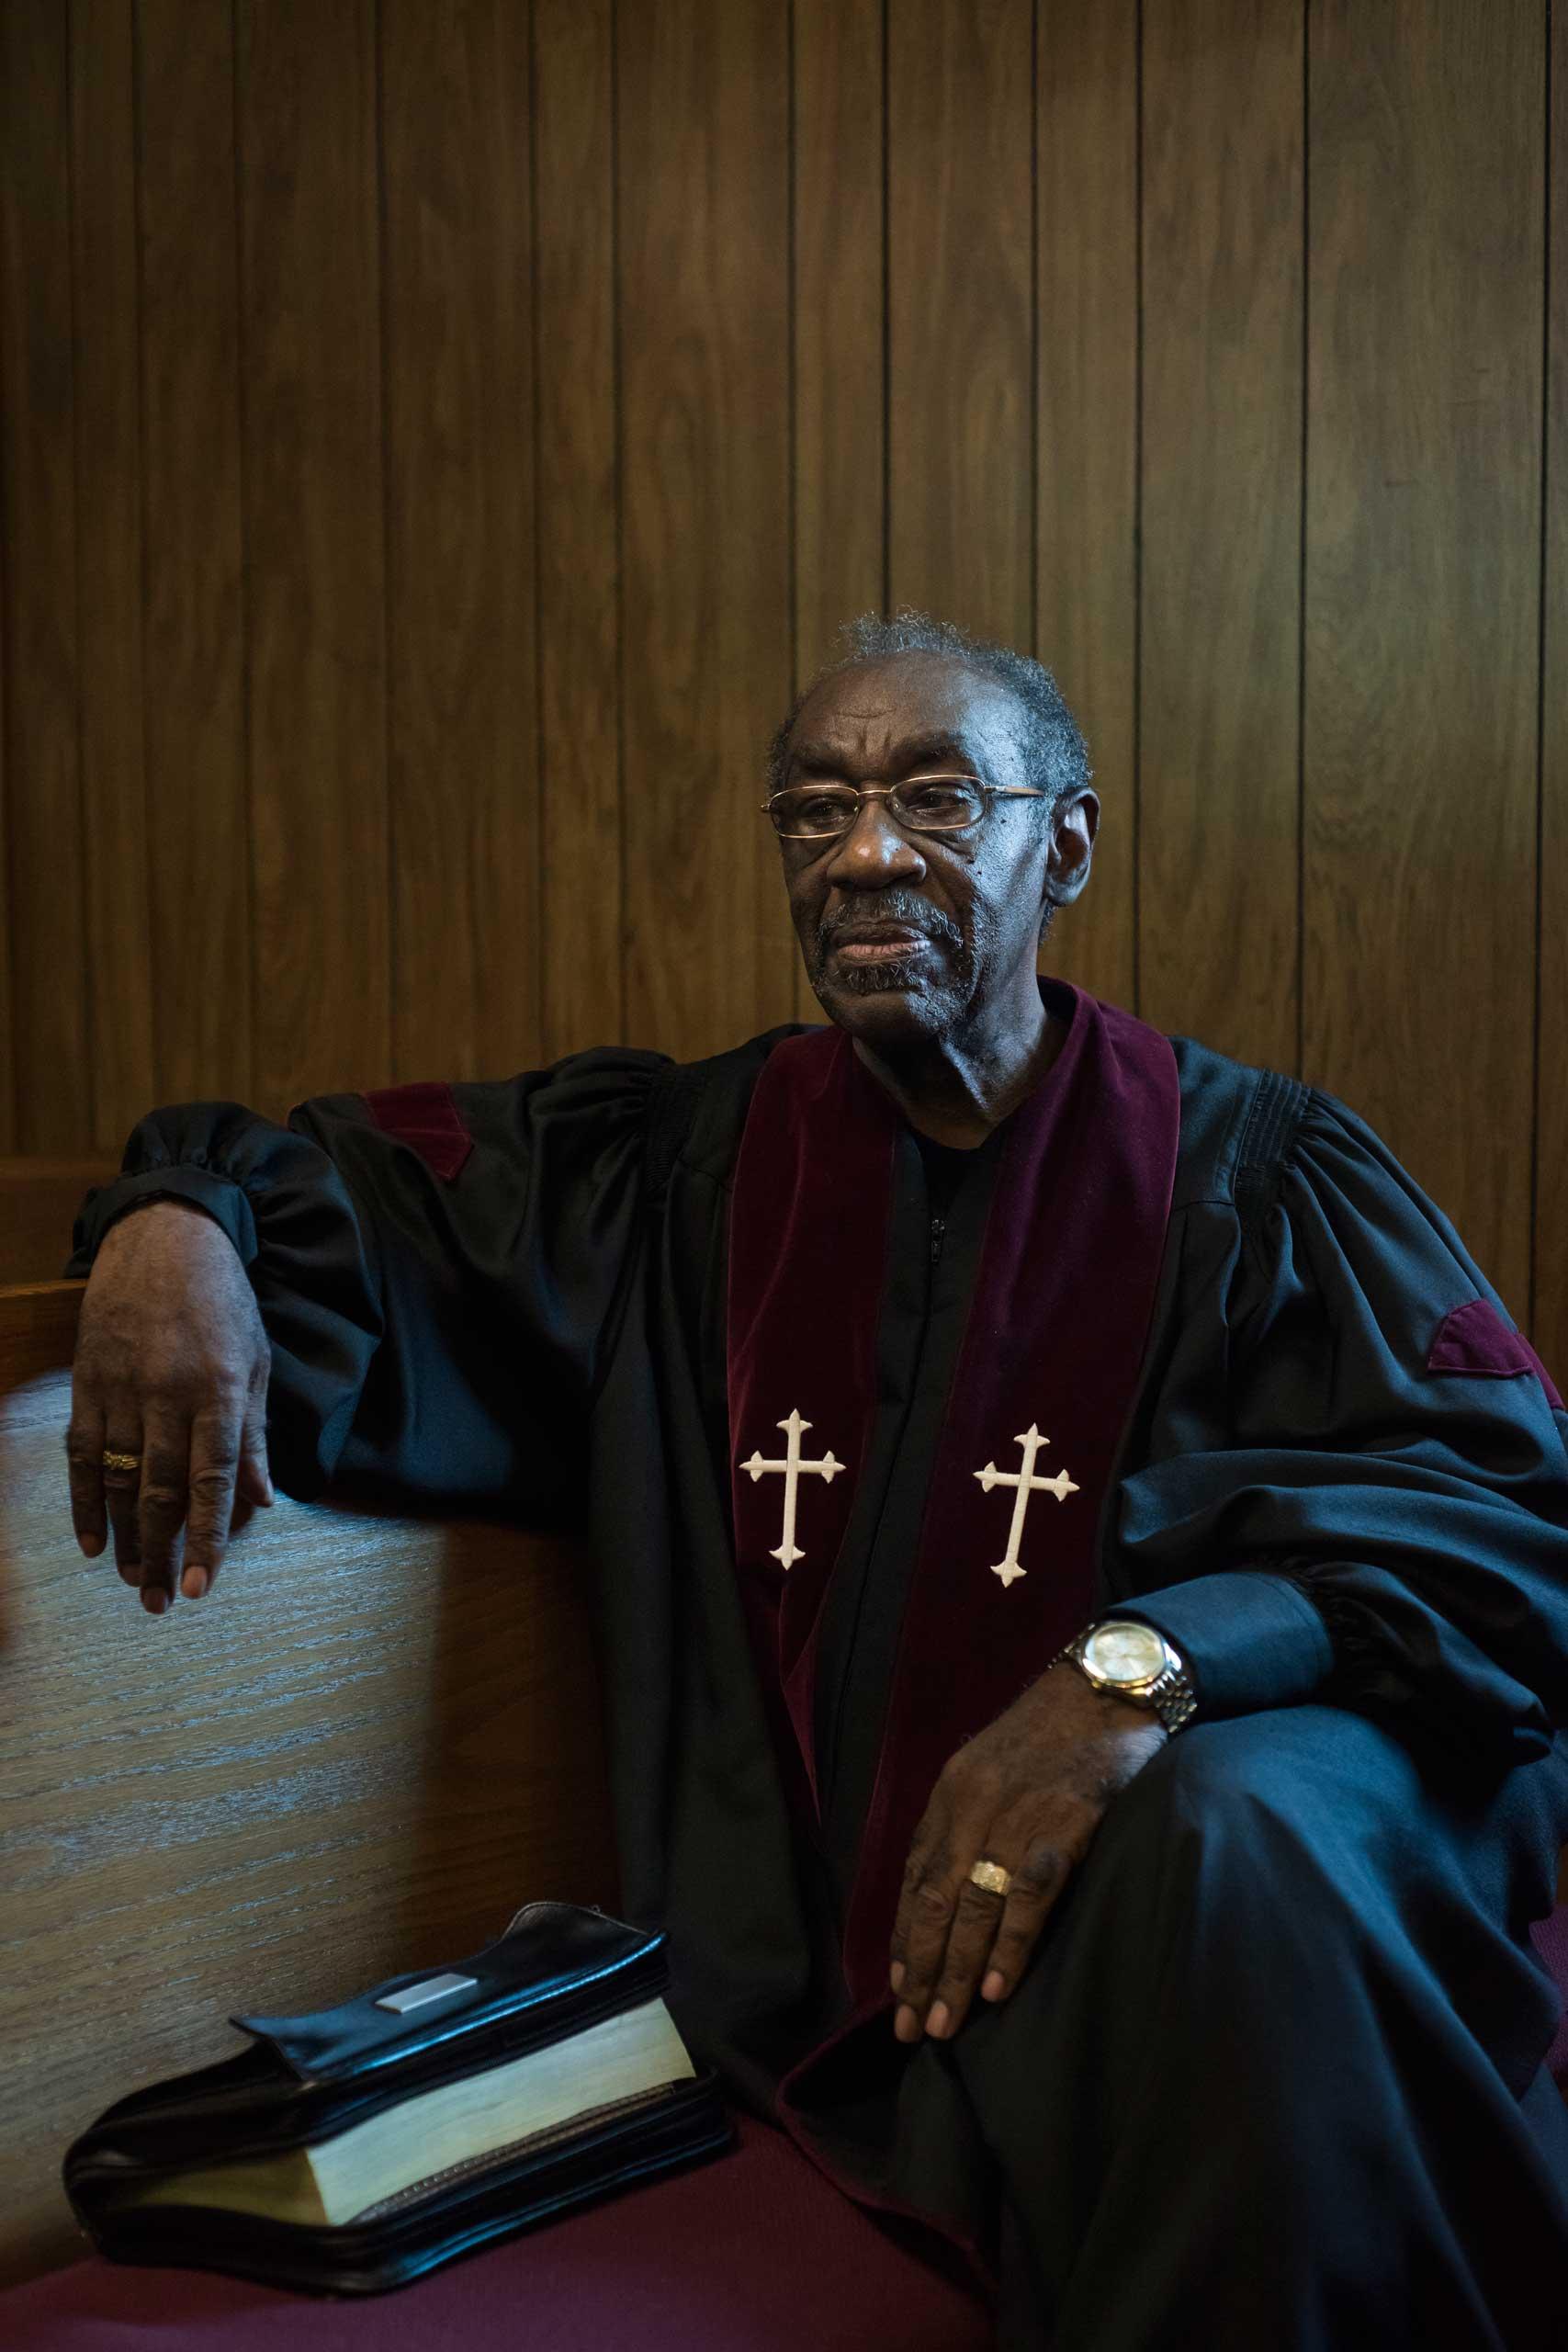 Rev. James Z. Williba, presiding minister at Christ Love Divine Missionary Baptist Church in Ferguson, Mo.